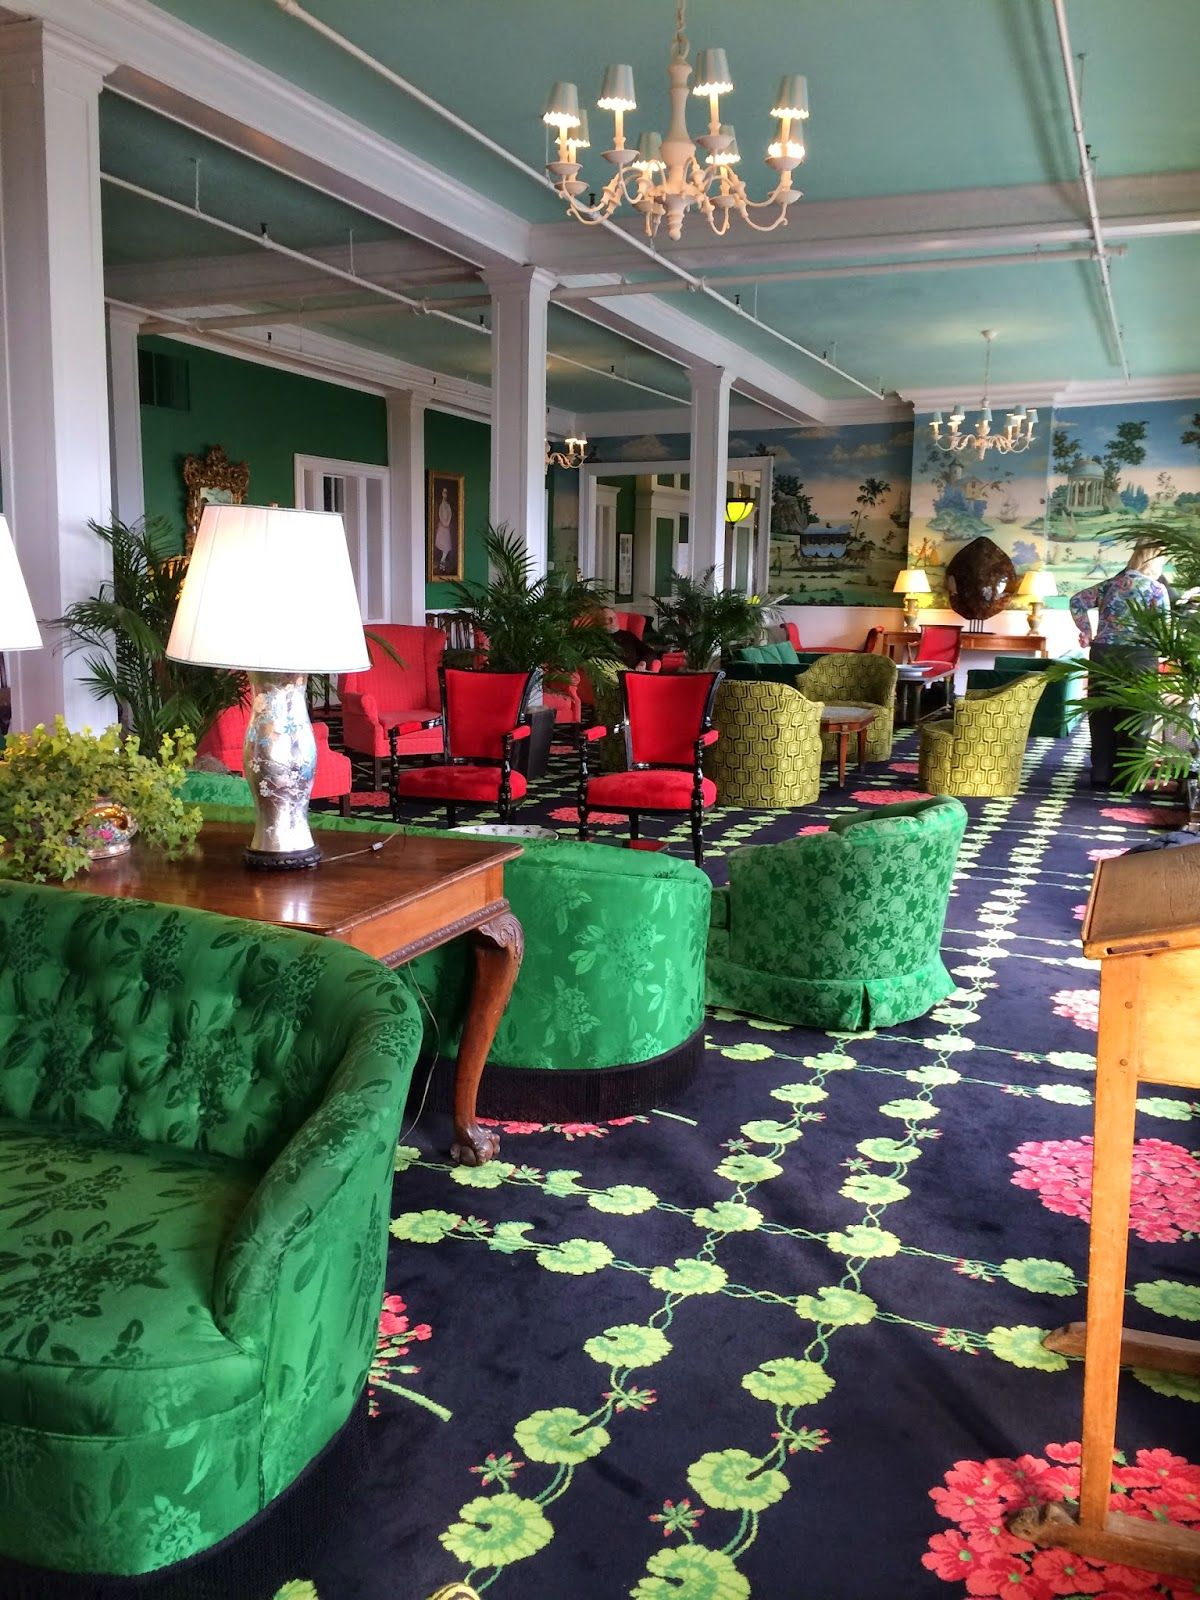 Christa Pirl Furniture Interiors At The Grand Grand Hotel Mackinac Island Mackinac Island Mackinac Island Michigan